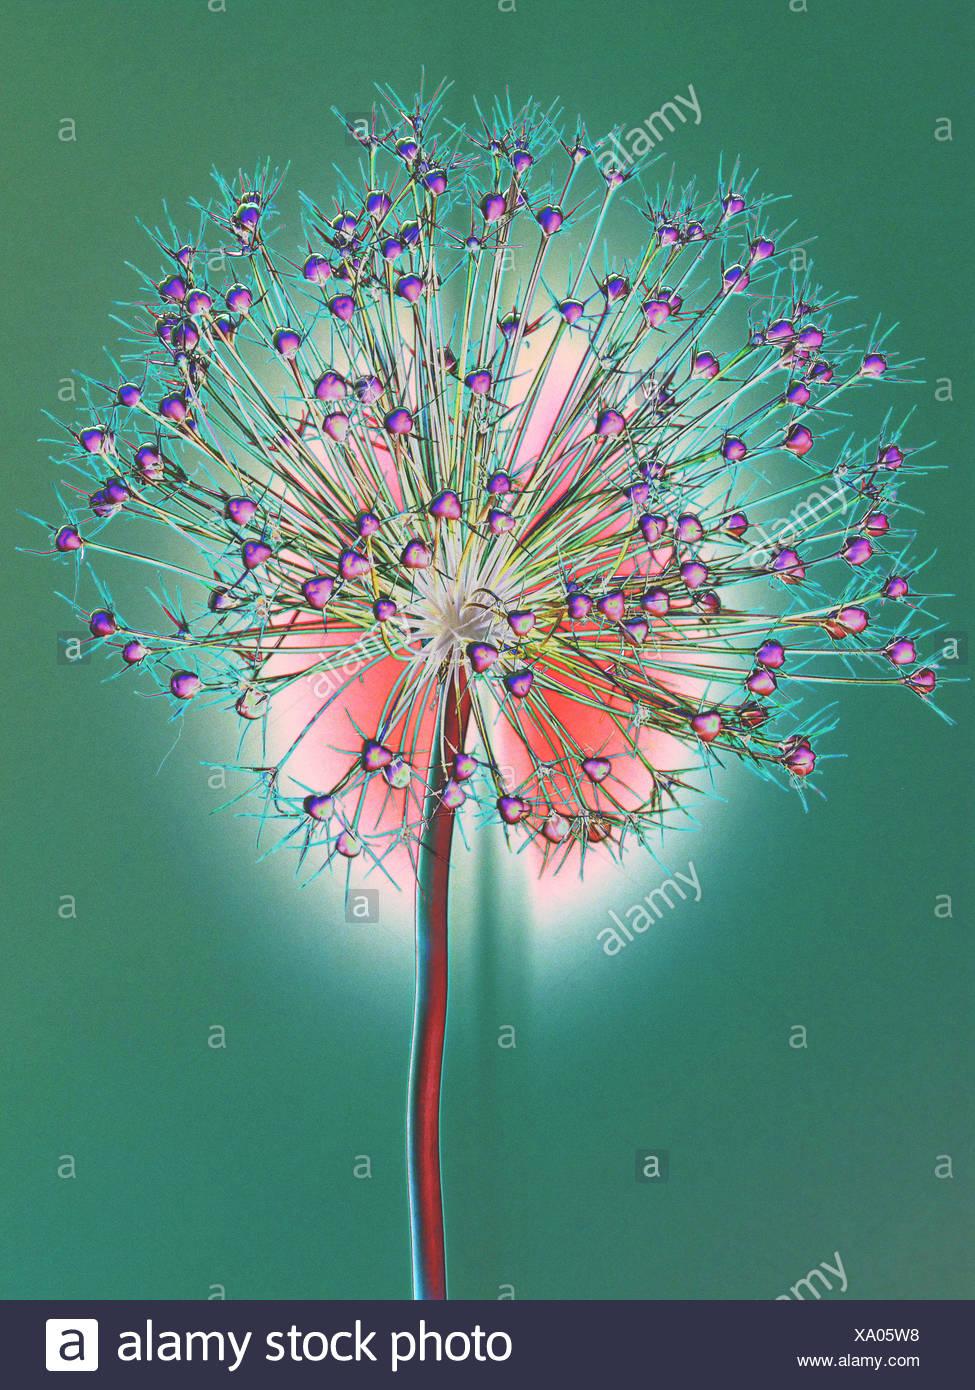 Blume, verwelkt, Allium, Konzept, Stern, Konzepte, Sterne, Licht, grün rot, entfremdet Stockbild